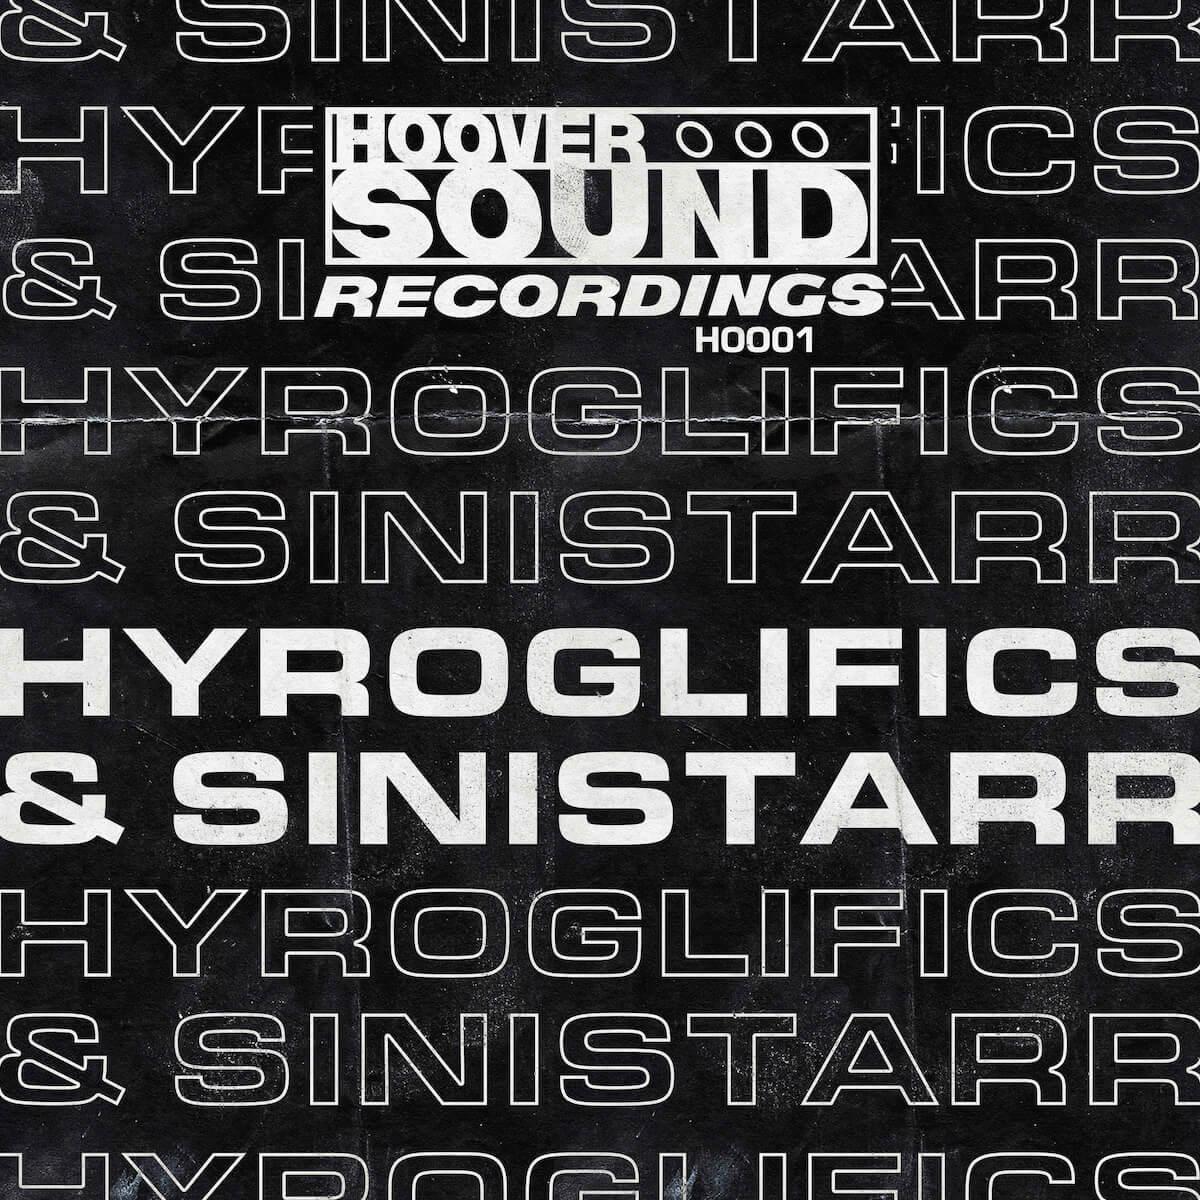 Hyroglifics and Sinistarr - BS6